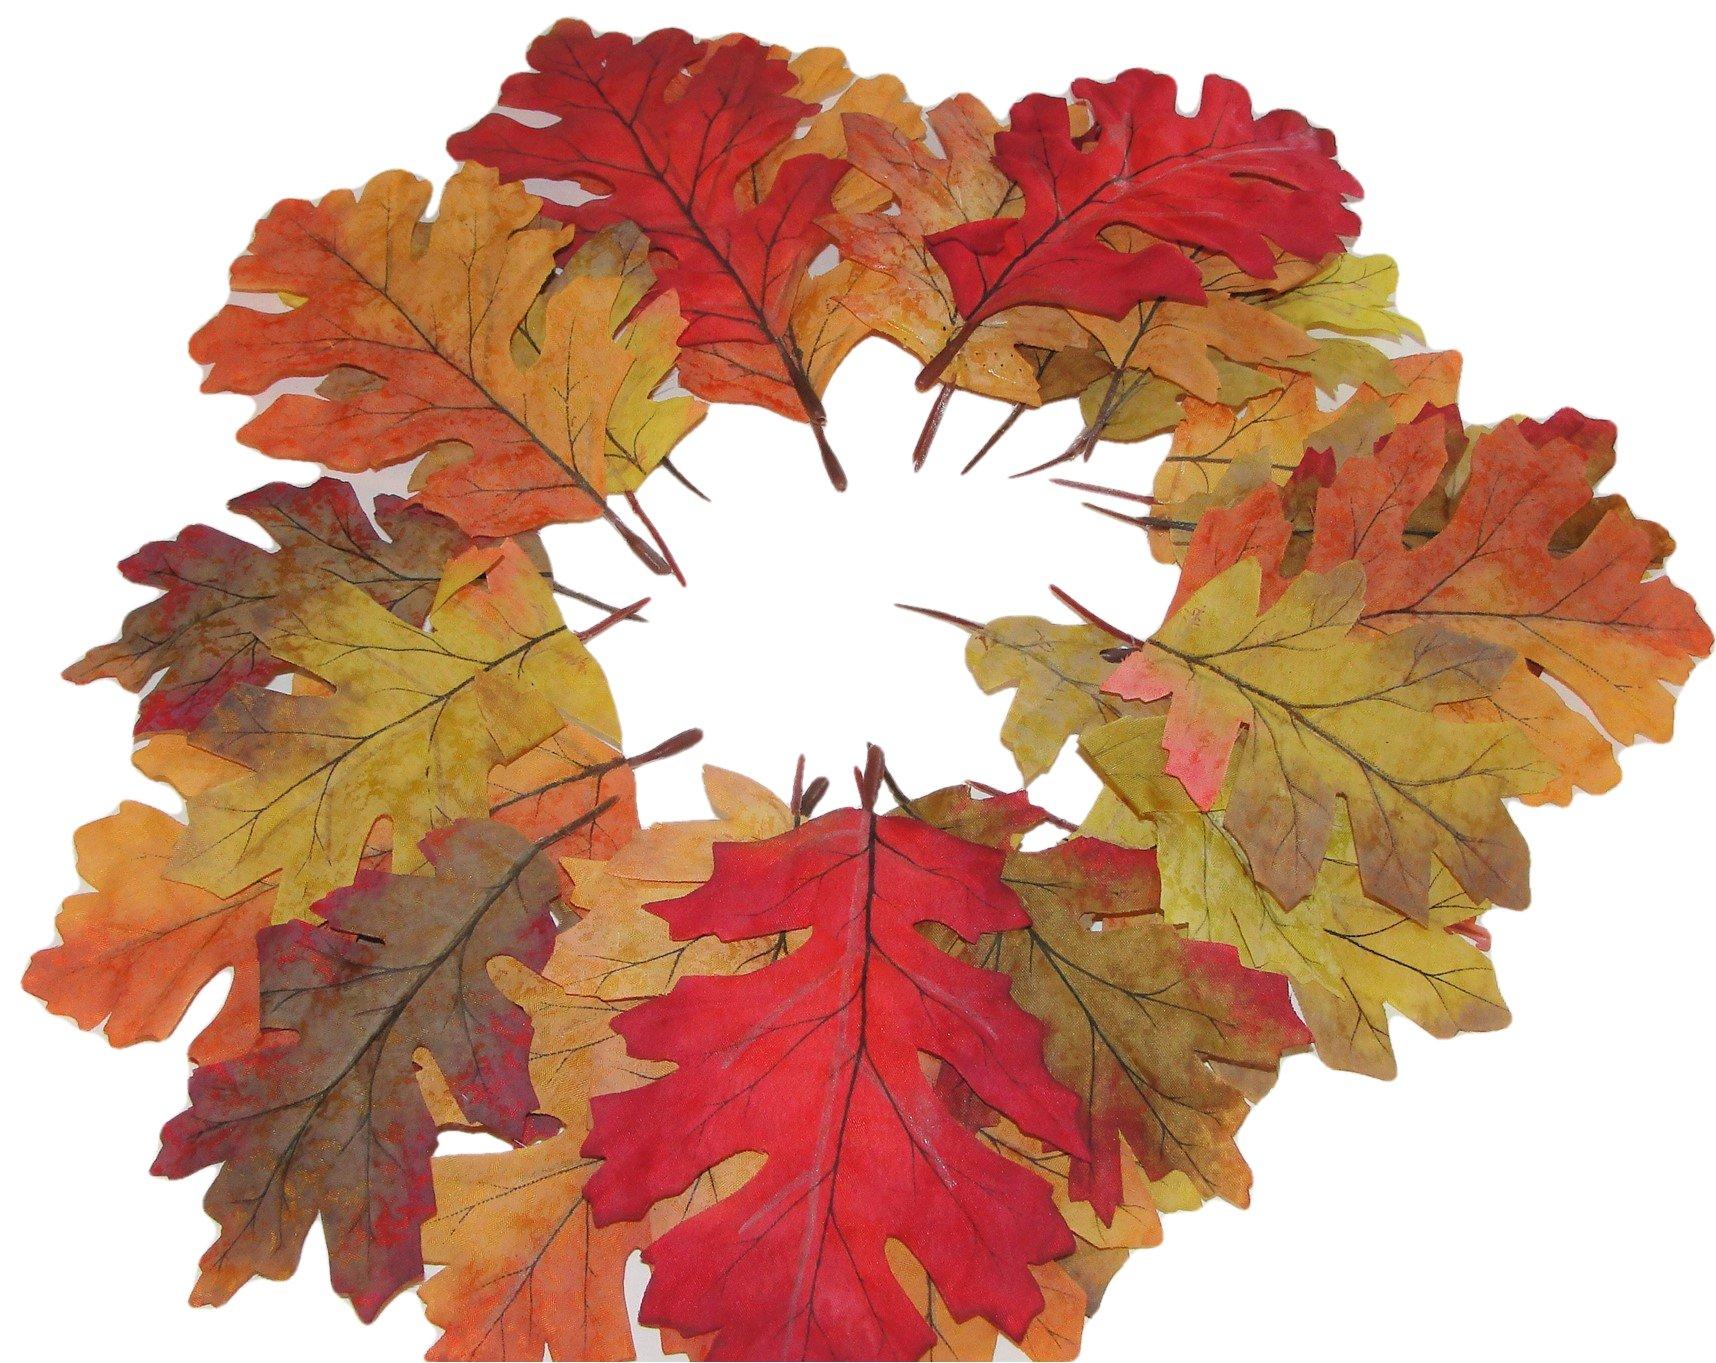 silk flower arrangements elegant blooms & things fall silk leaves, mixed colors & sizes, 35 pcs